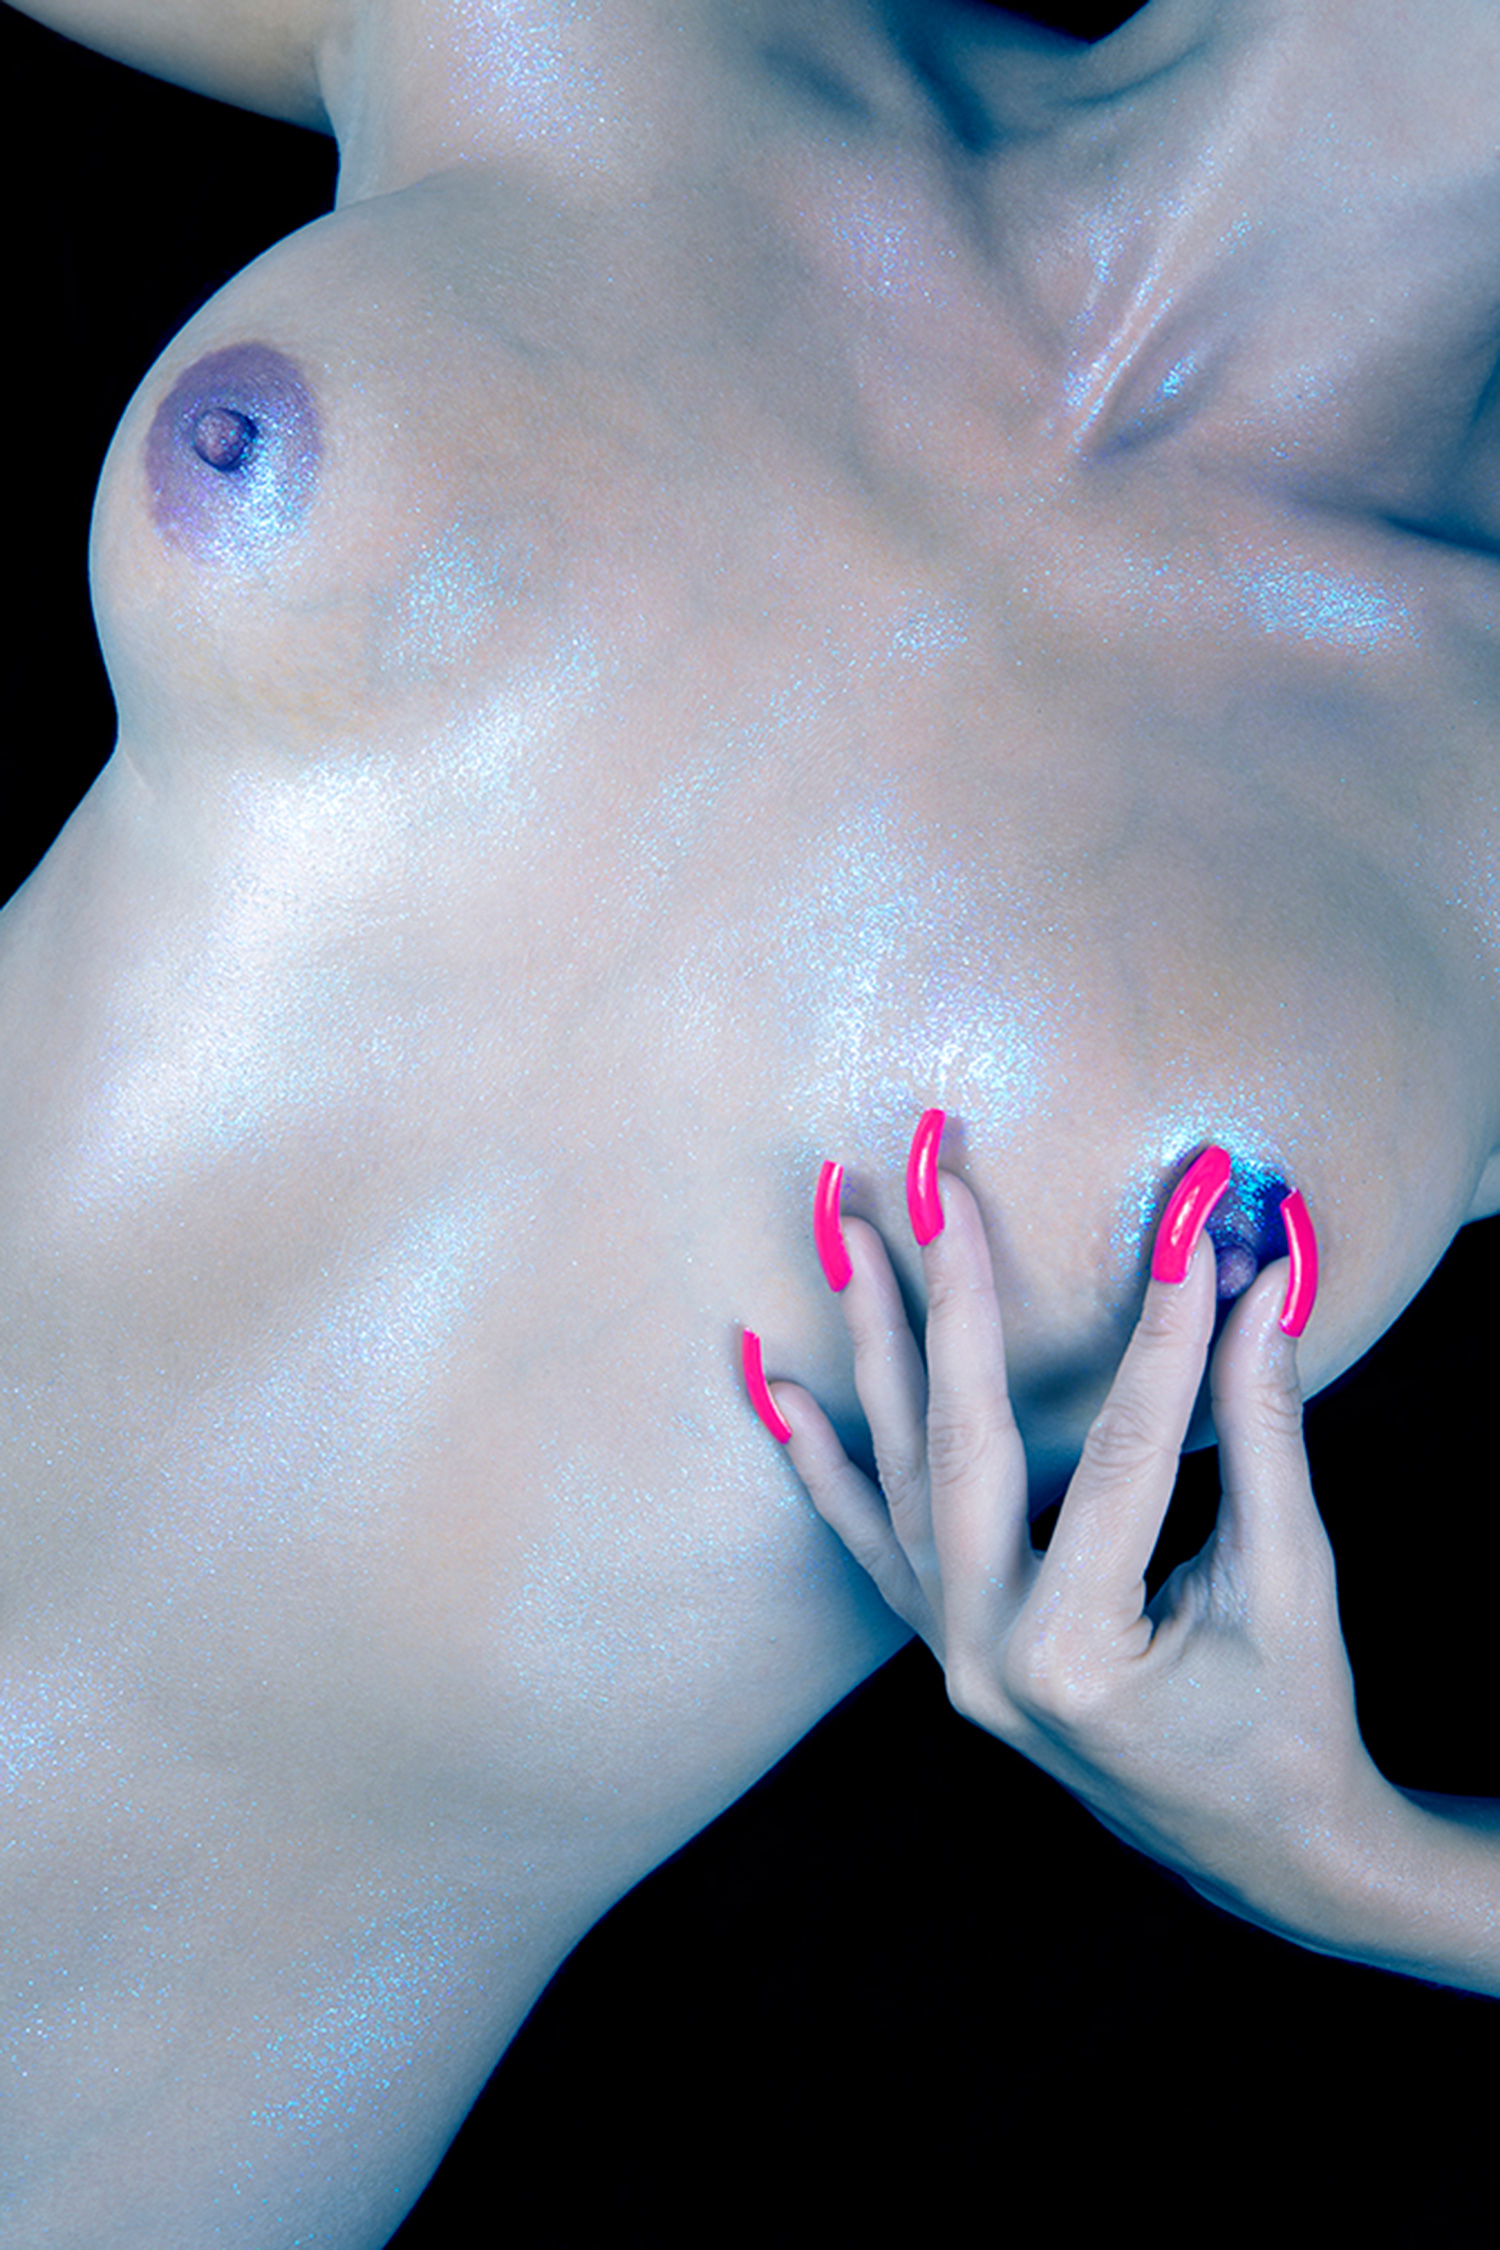 Erotic Photographers - Chloe Newman, nipple and pink nails